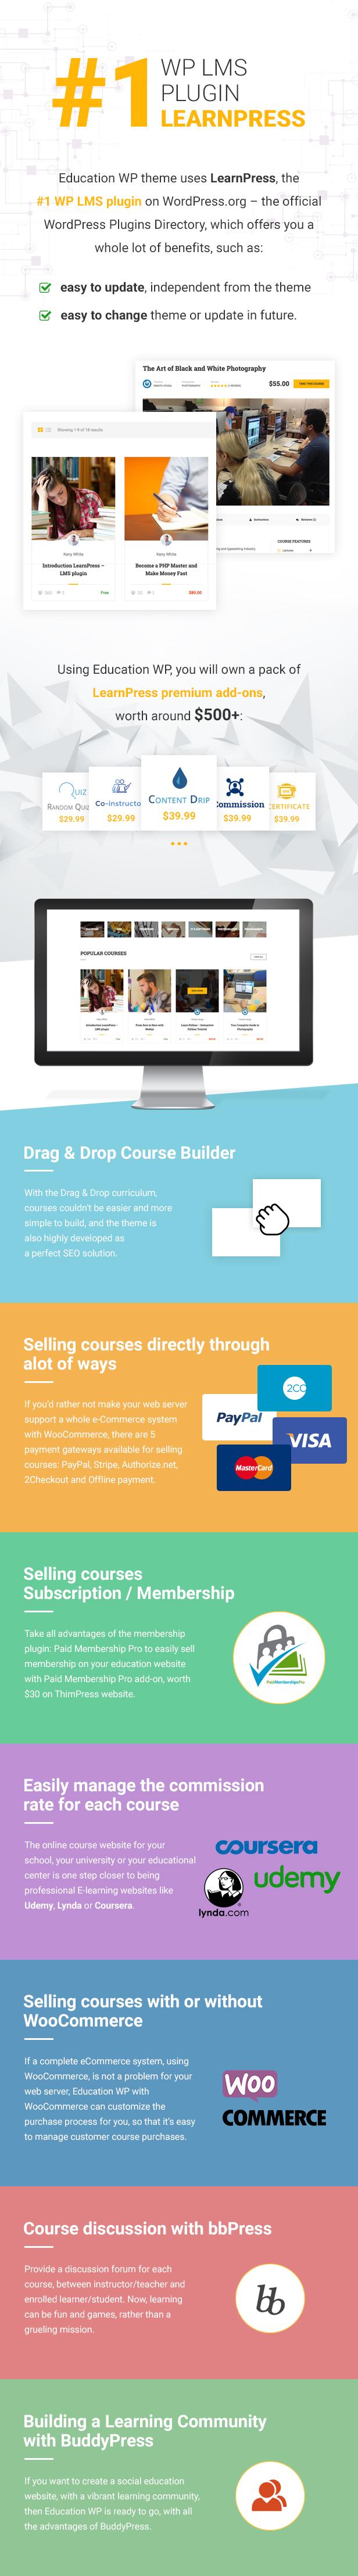 Картинка шаблонаEducation-WordPress-theme-Using-LMS-plugin-LearnPress